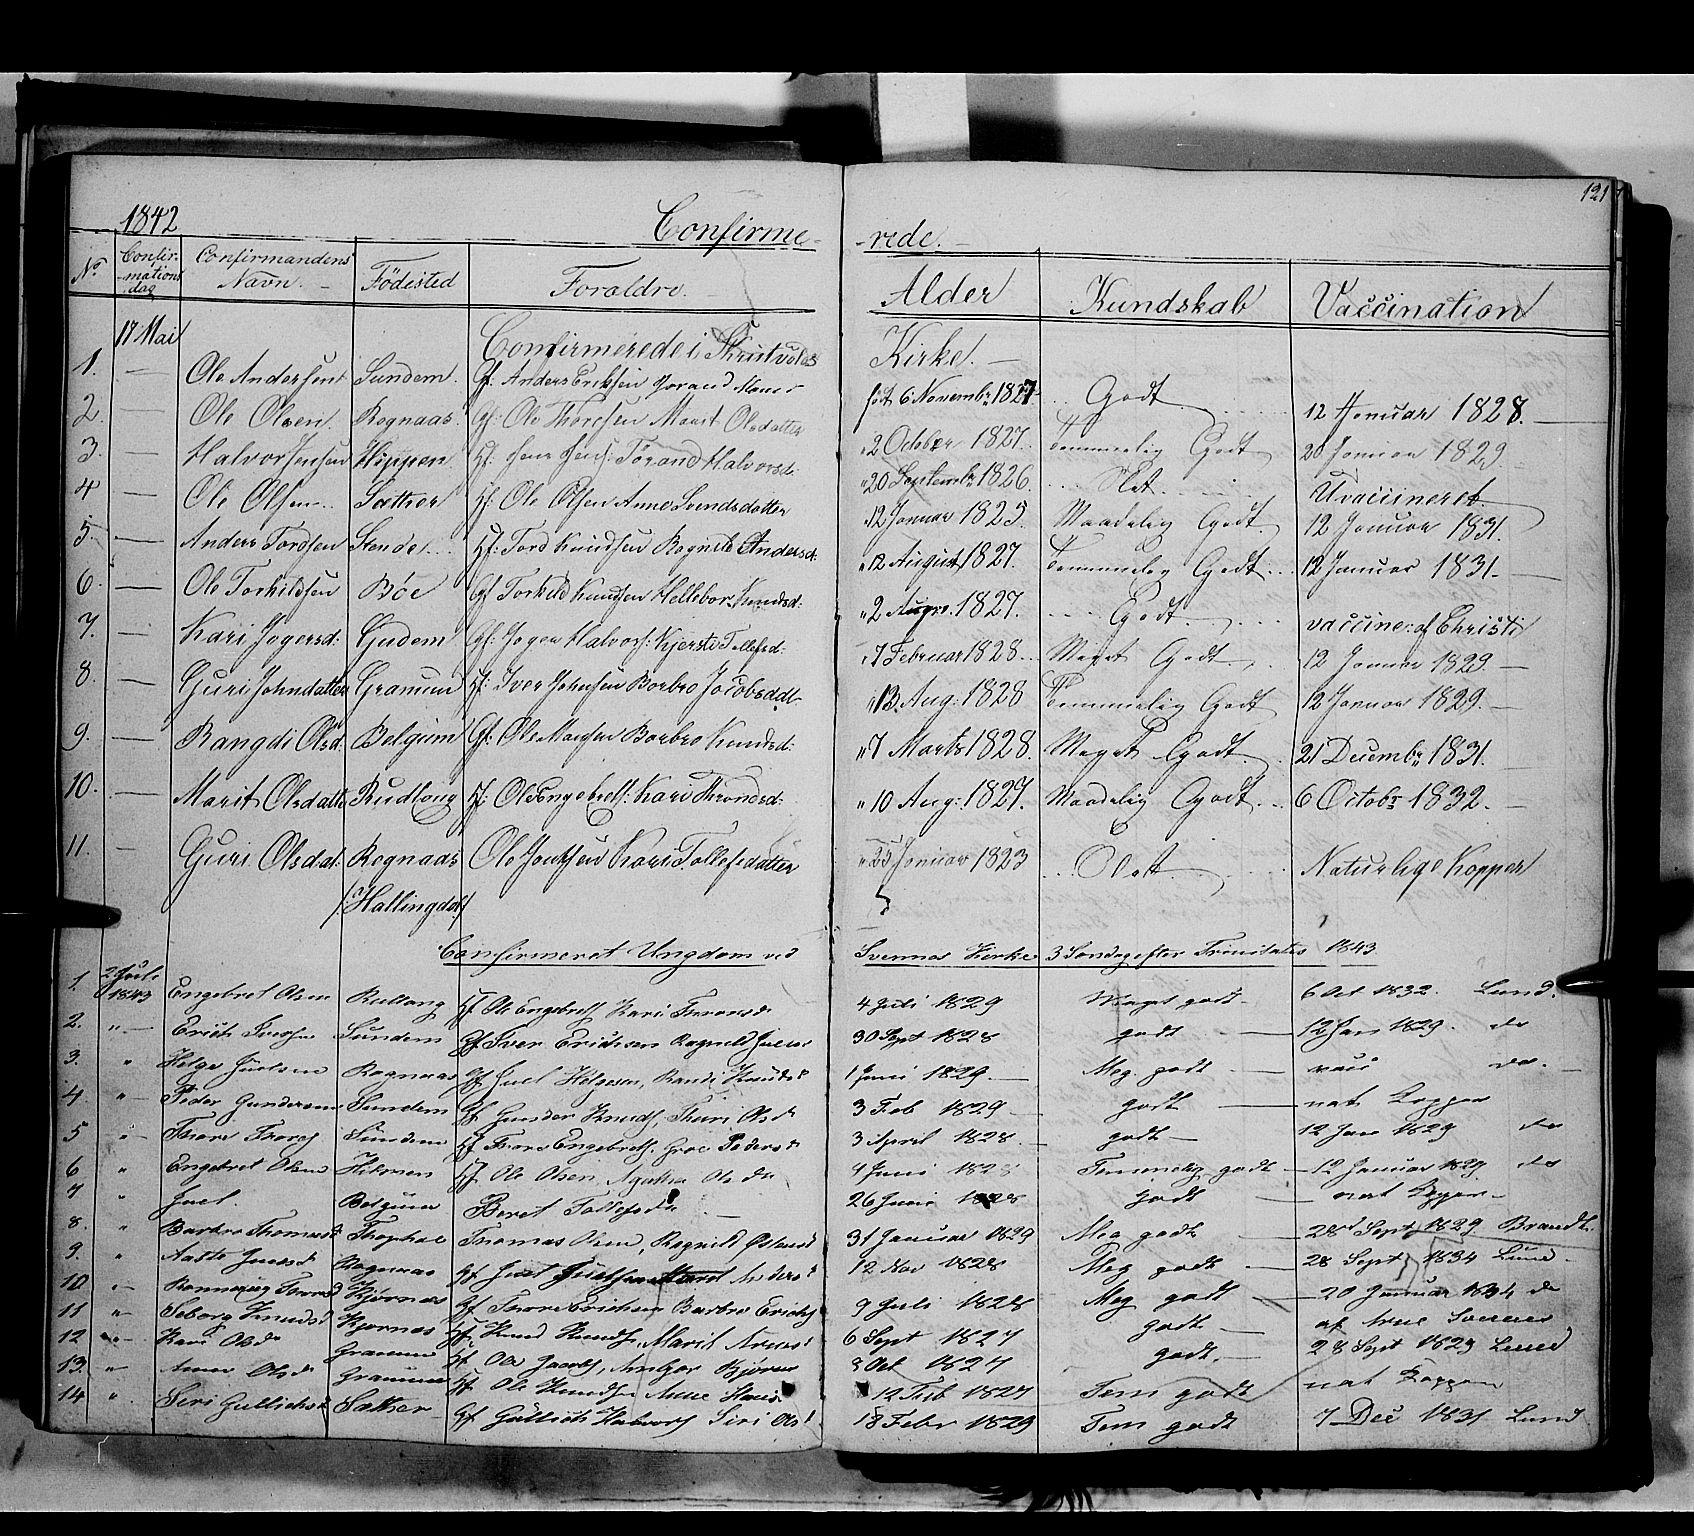 SAH, Nord-Aurdal prestekontor, Ministerialbok nr. 6, 1842-1863, s. 121